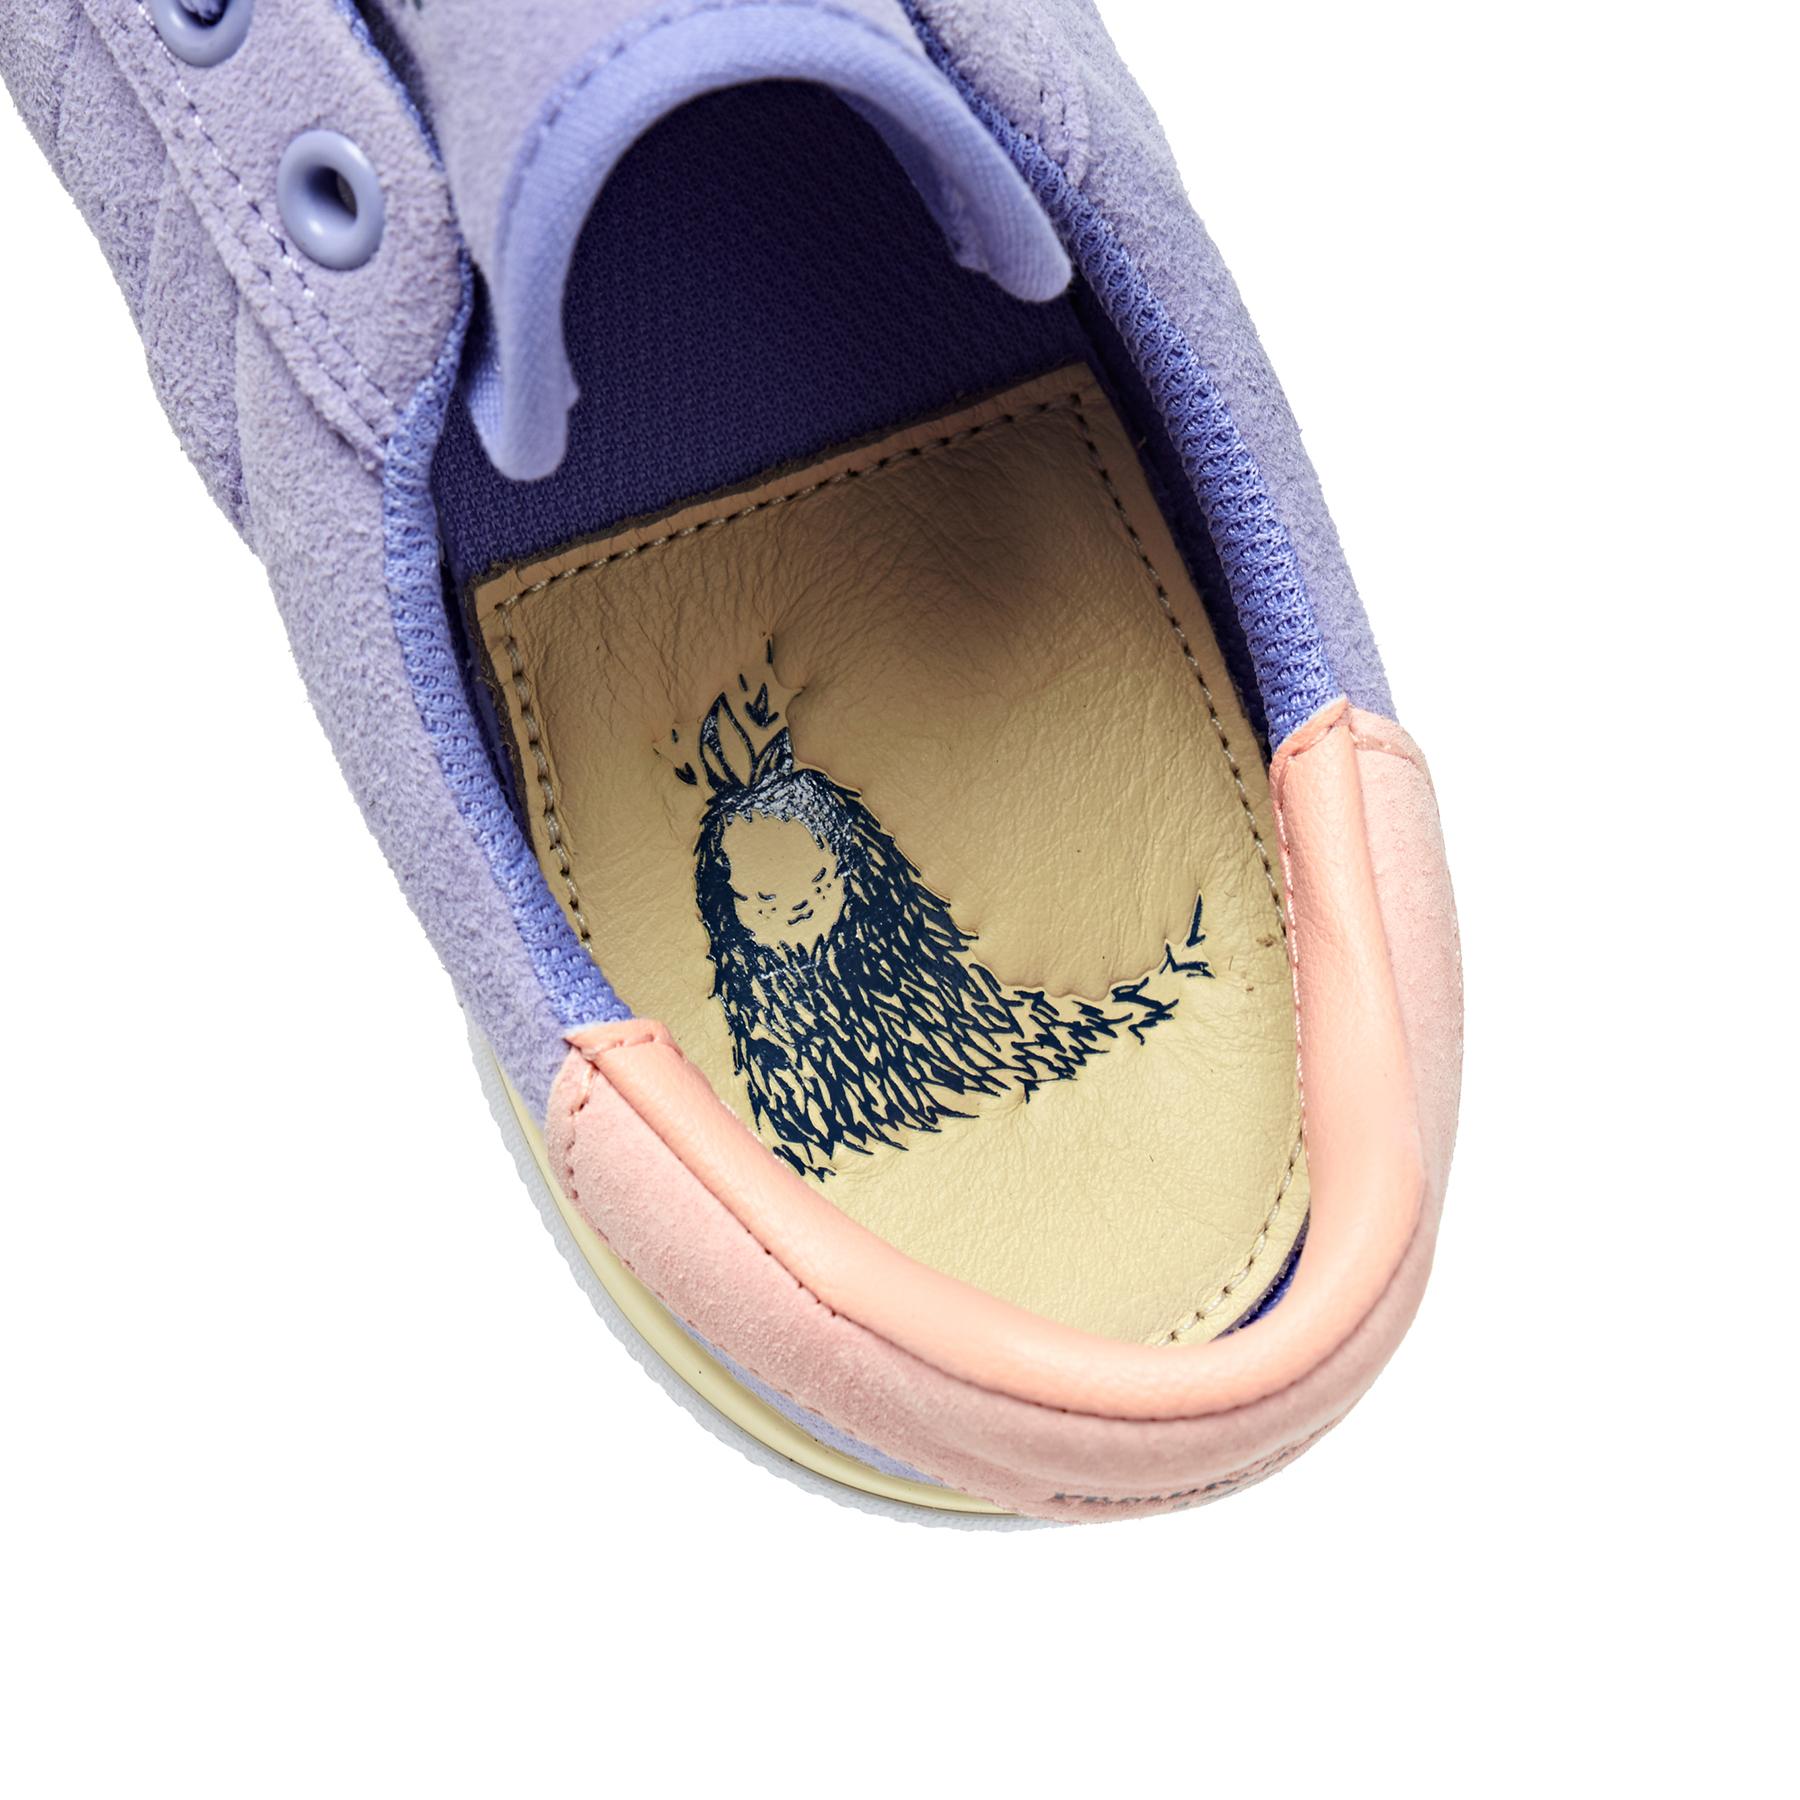 adidas Skateboarding x Nora 3MC Schuh (light purple glow pink mist sun)